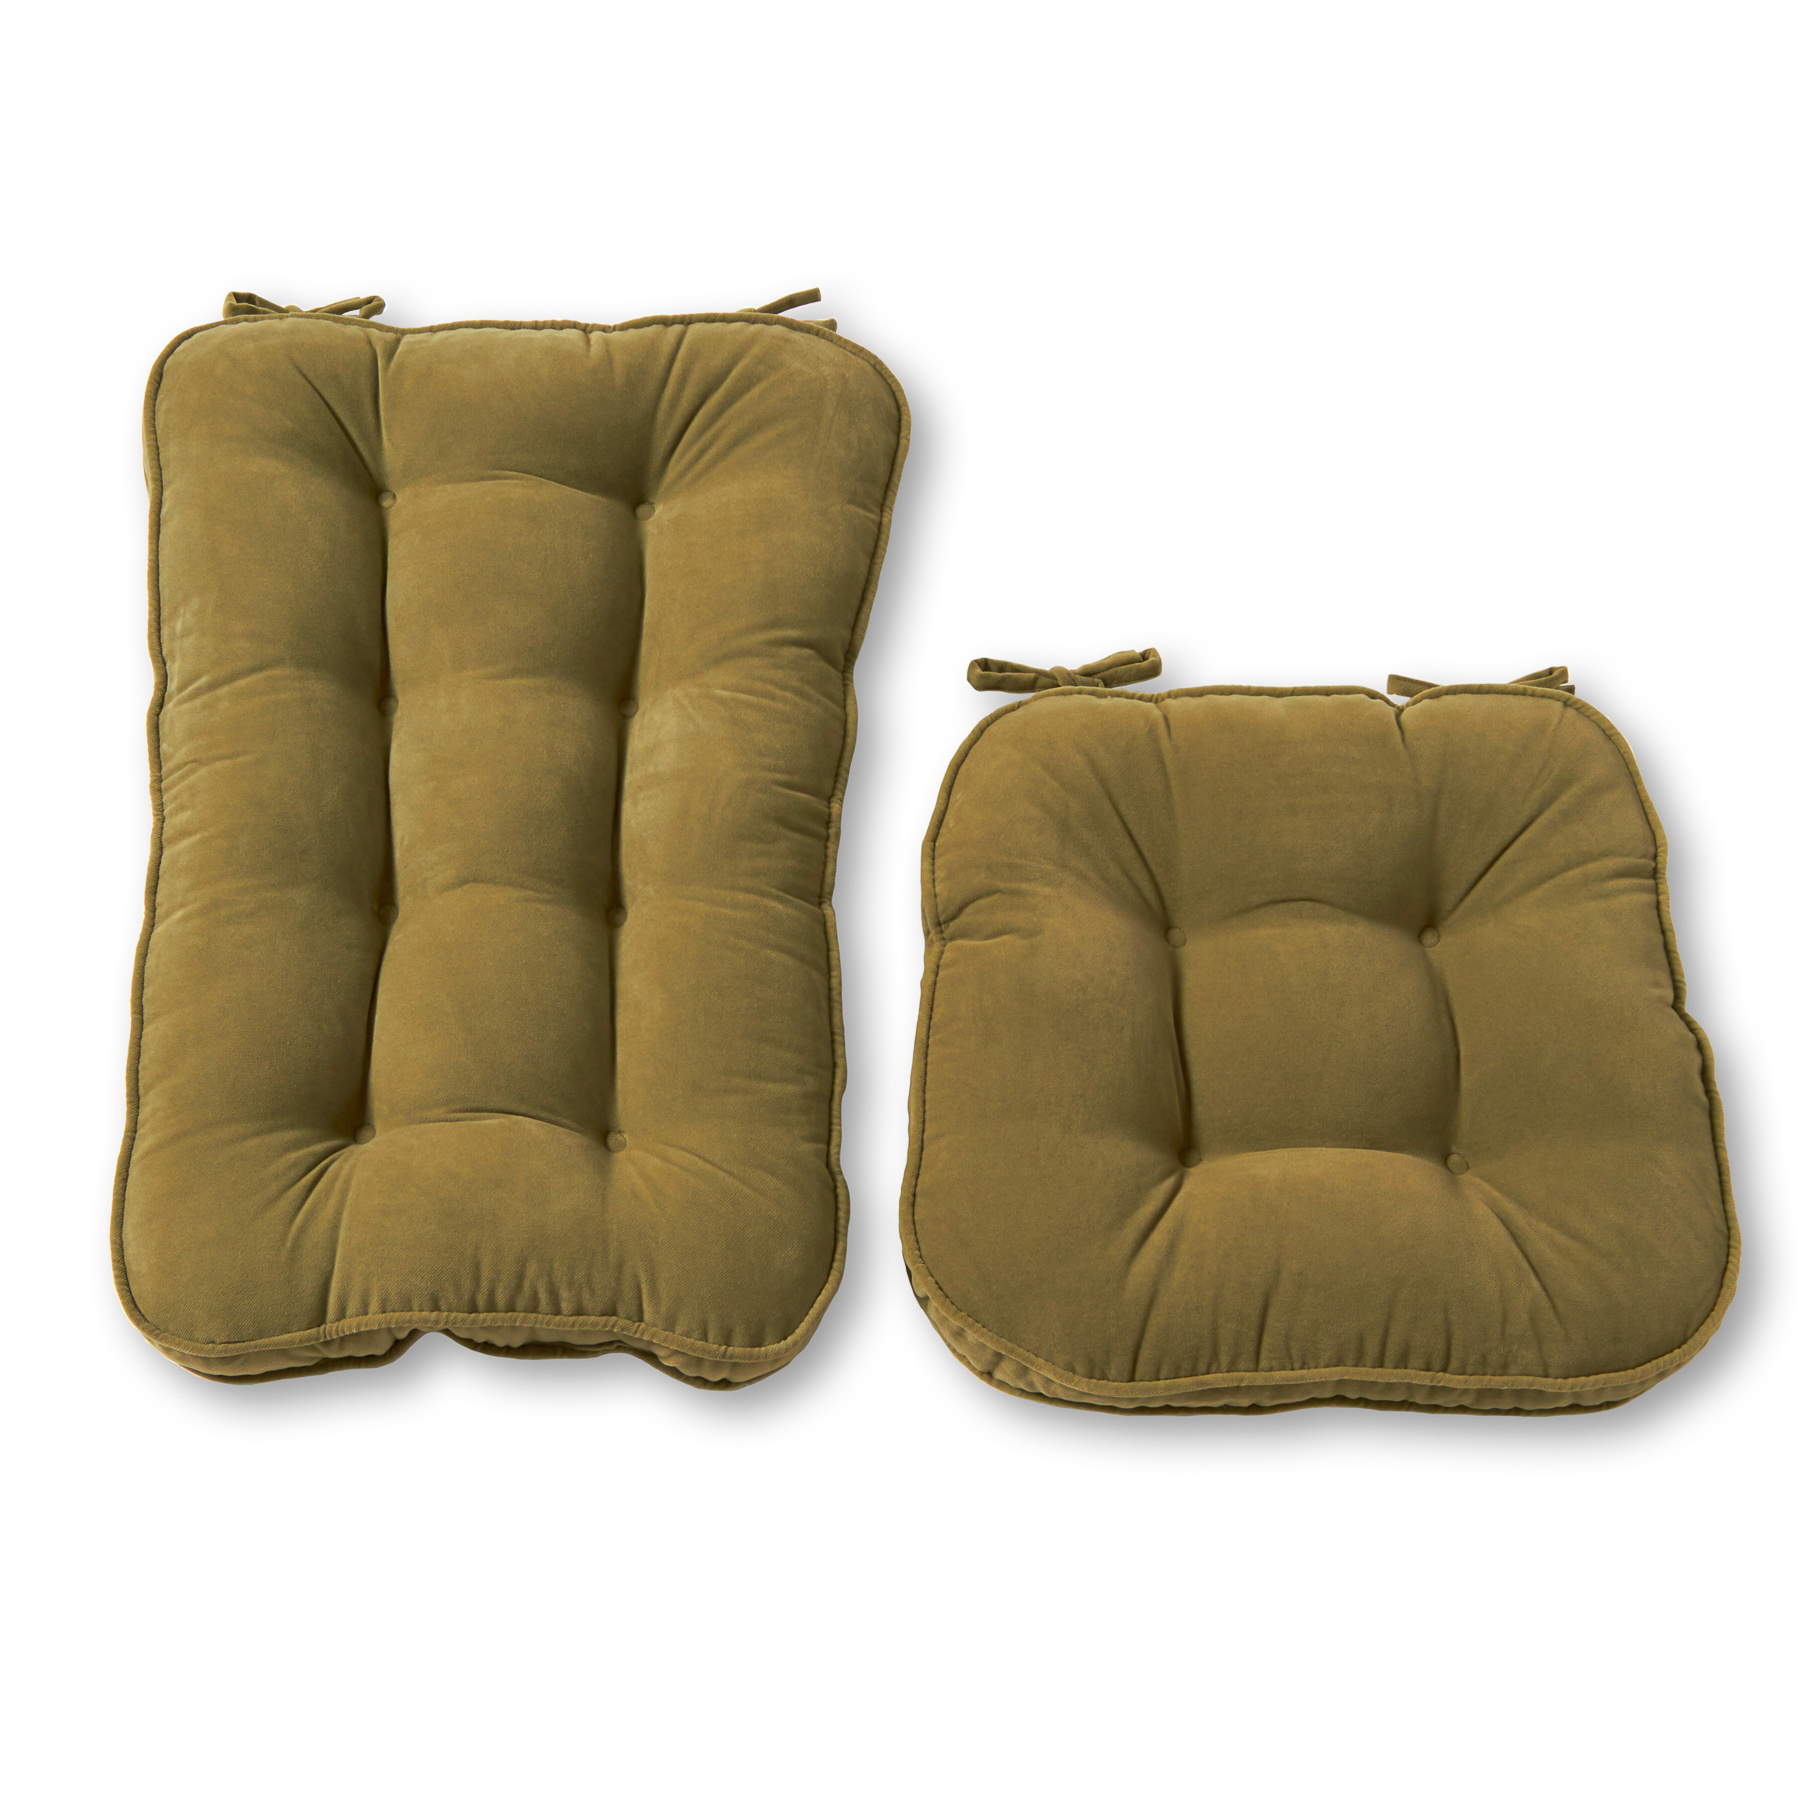 Hyatt Jumbo 2 Piece Rocking Chair Cushion Set